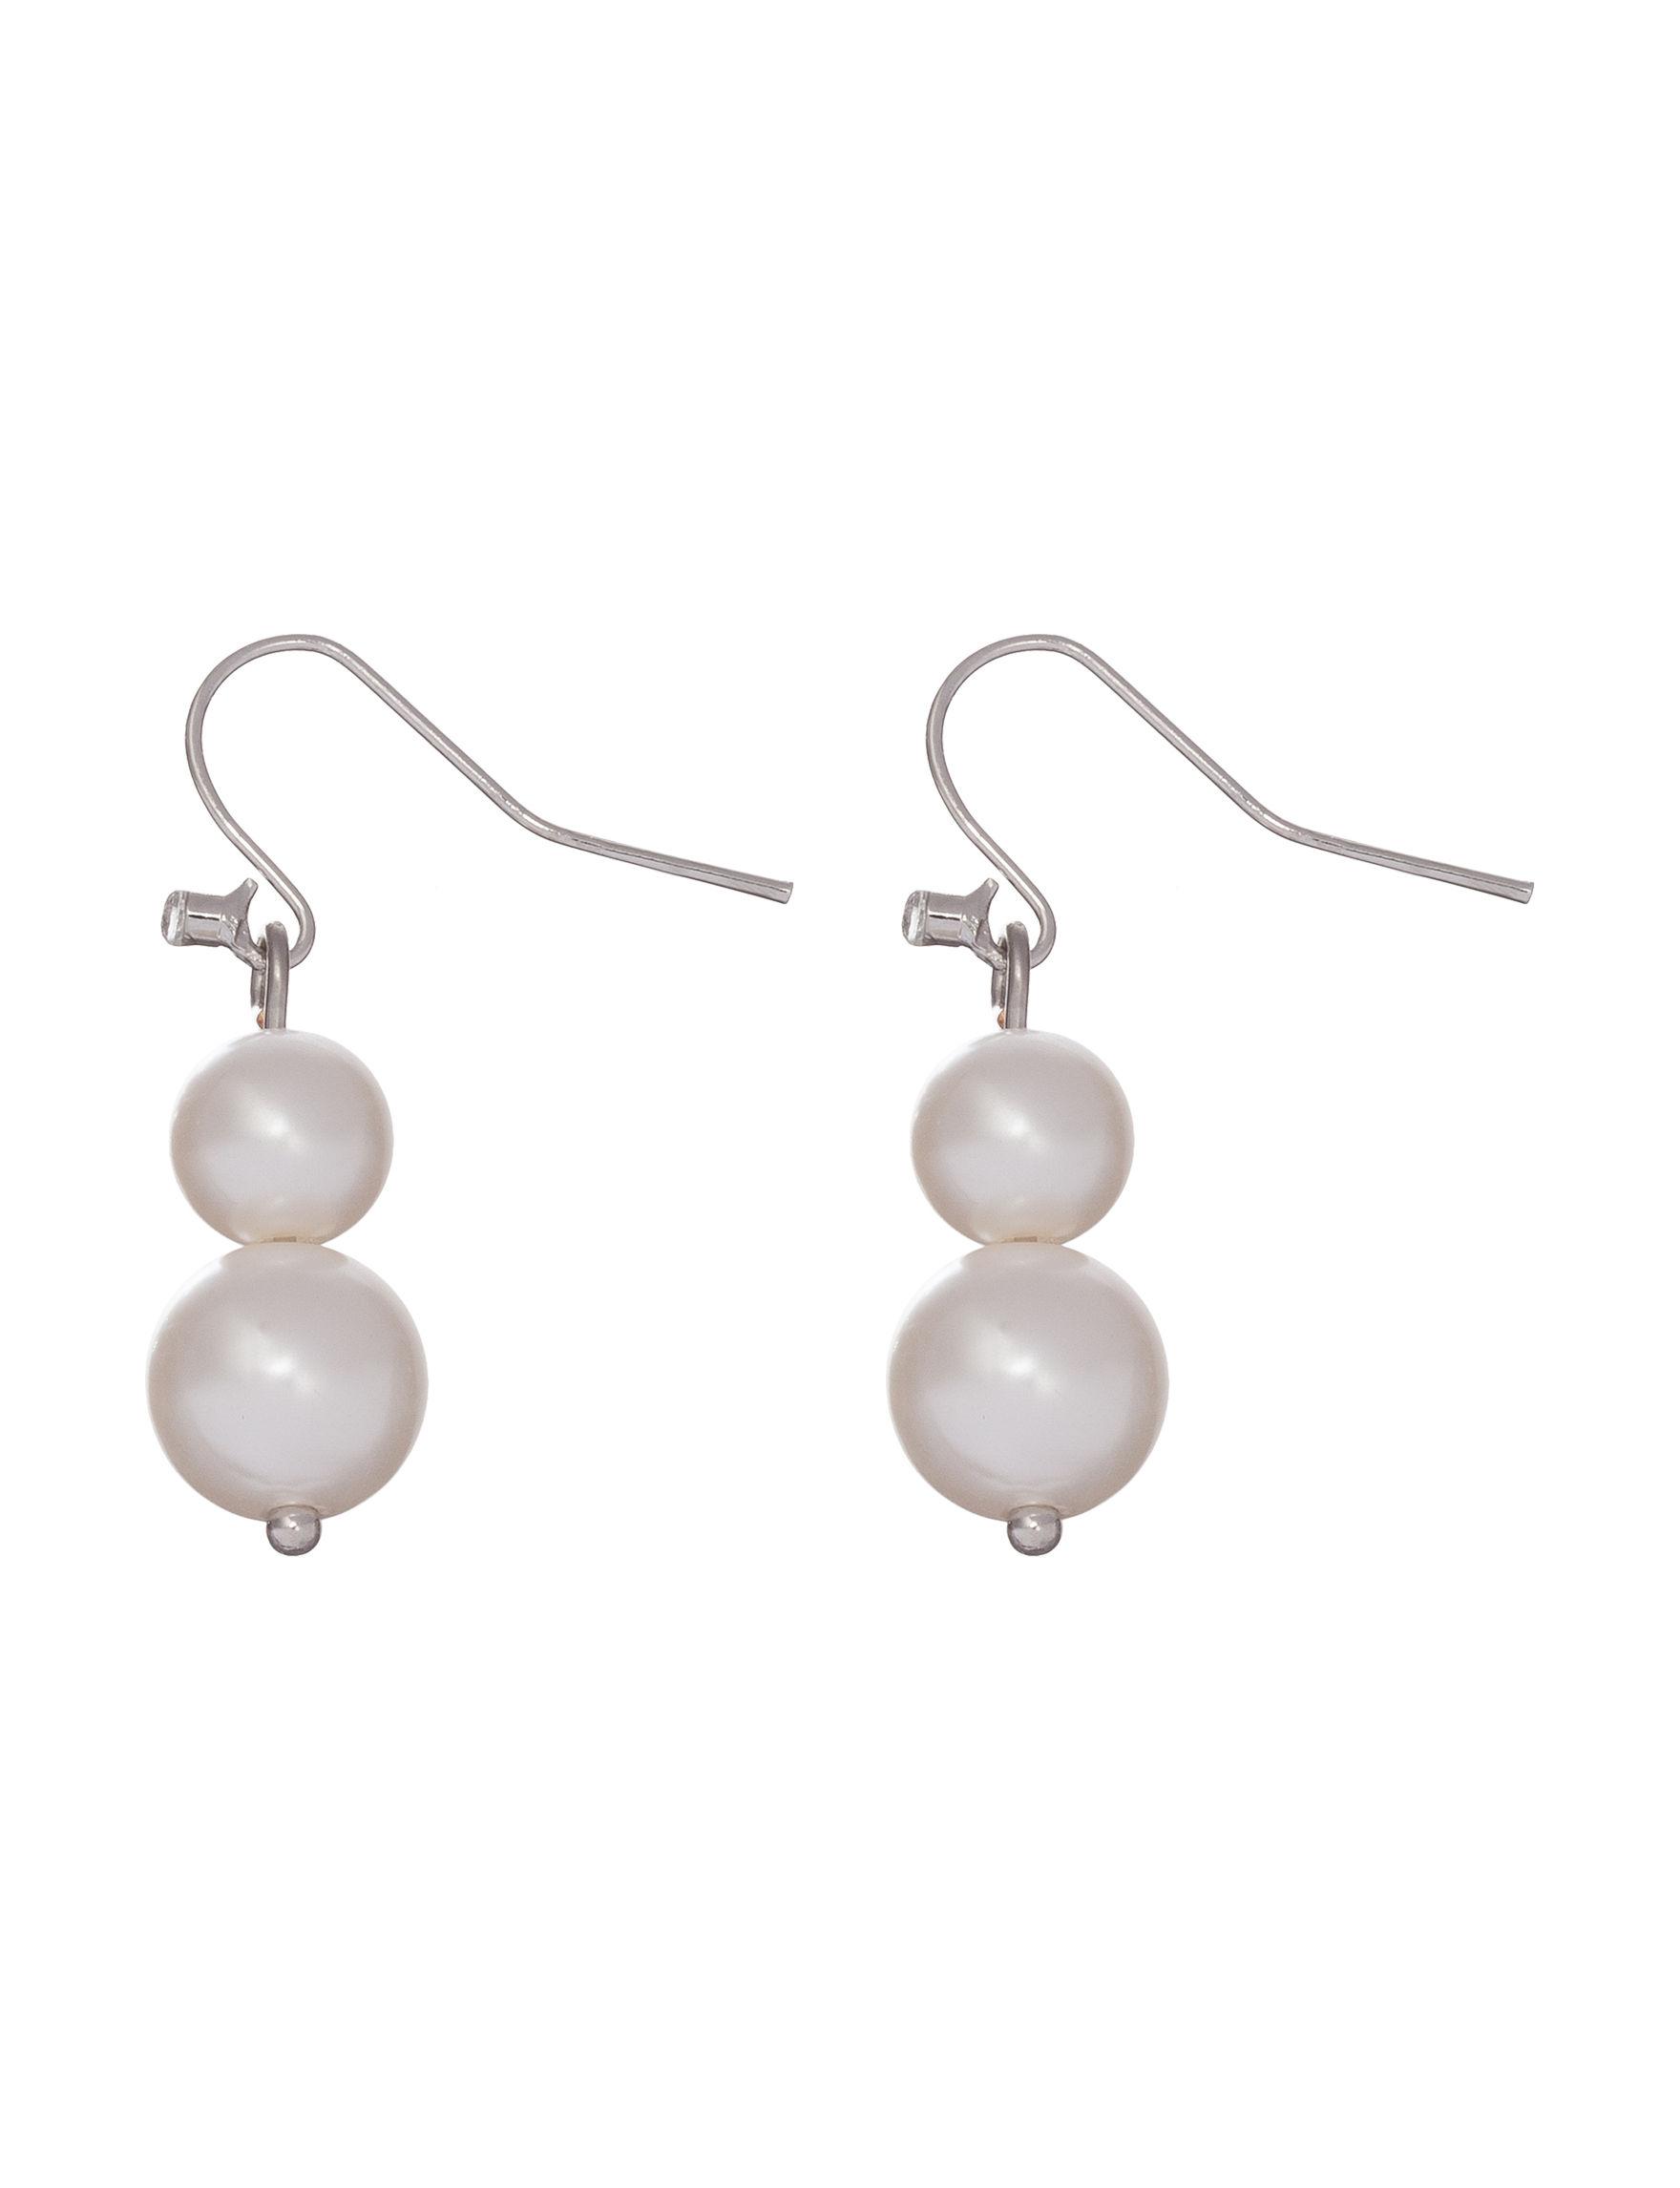 Hannah Silver / Pearl Fashion Jewelry